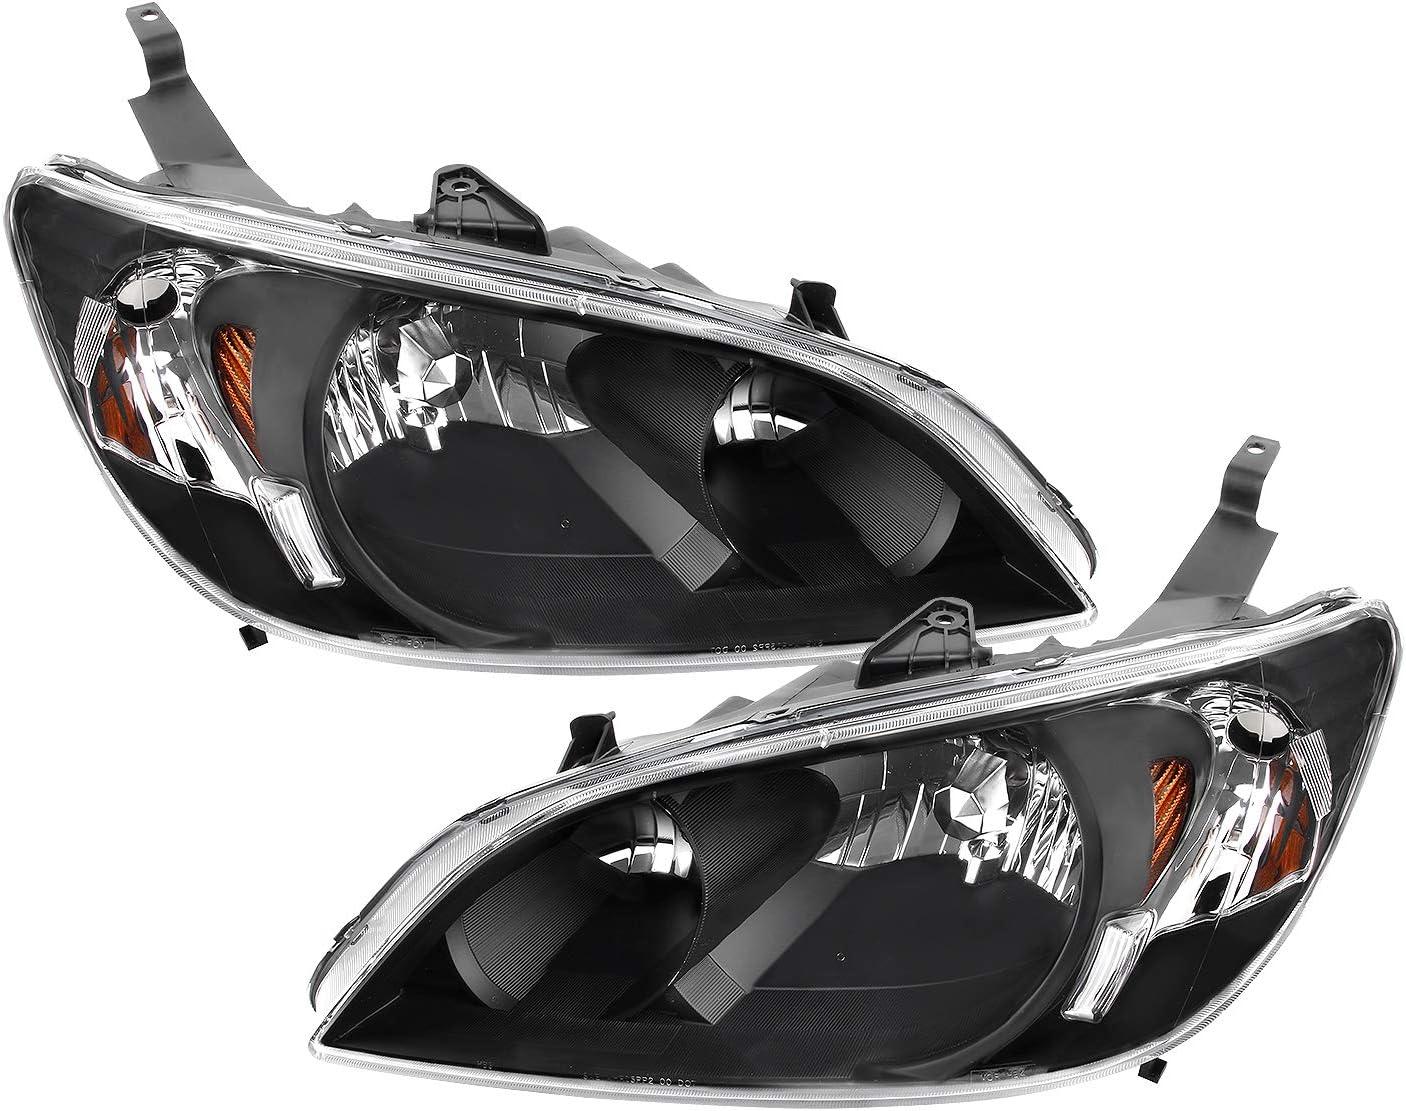 Right 04 05 Fits 2004 2005 Honda Civic Headlights Front Headlamps ...